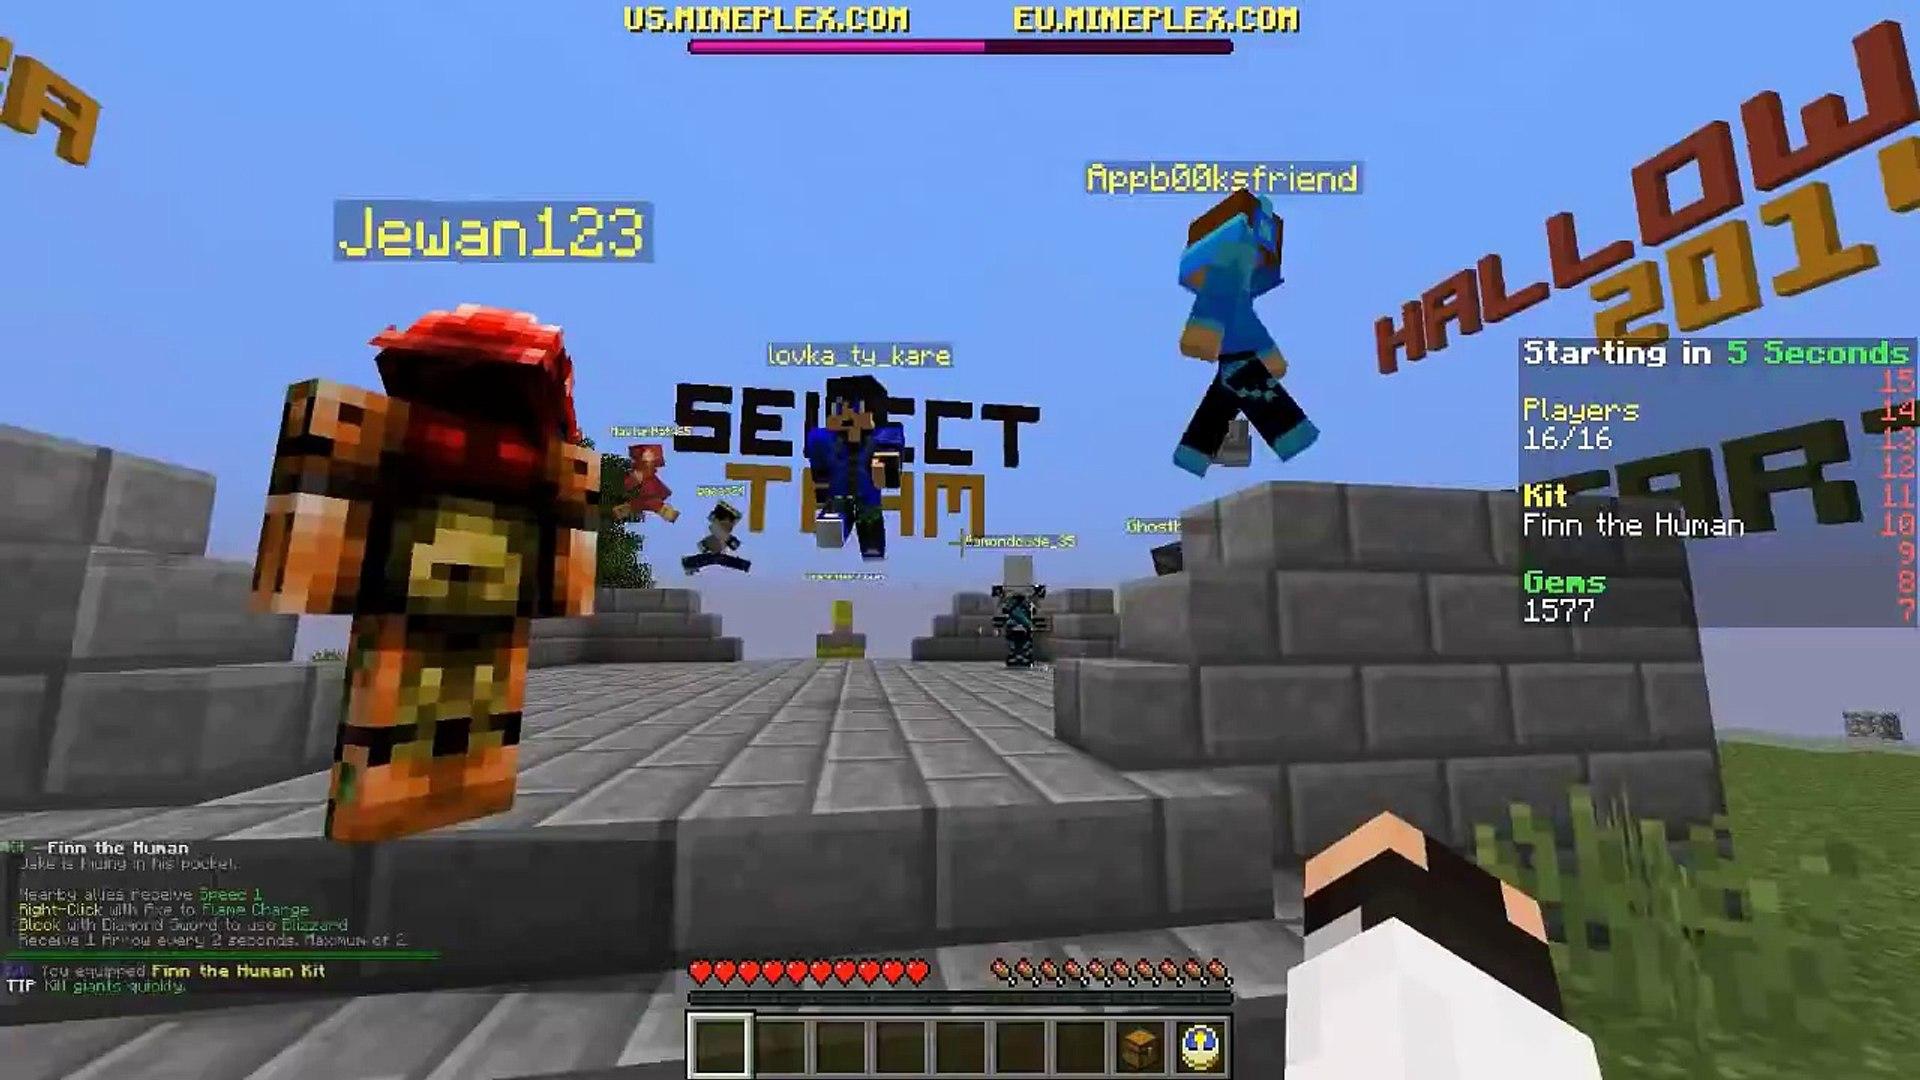 Minecraft: Halloween Horror - ماينكرافت لعبة رعب الهالوين